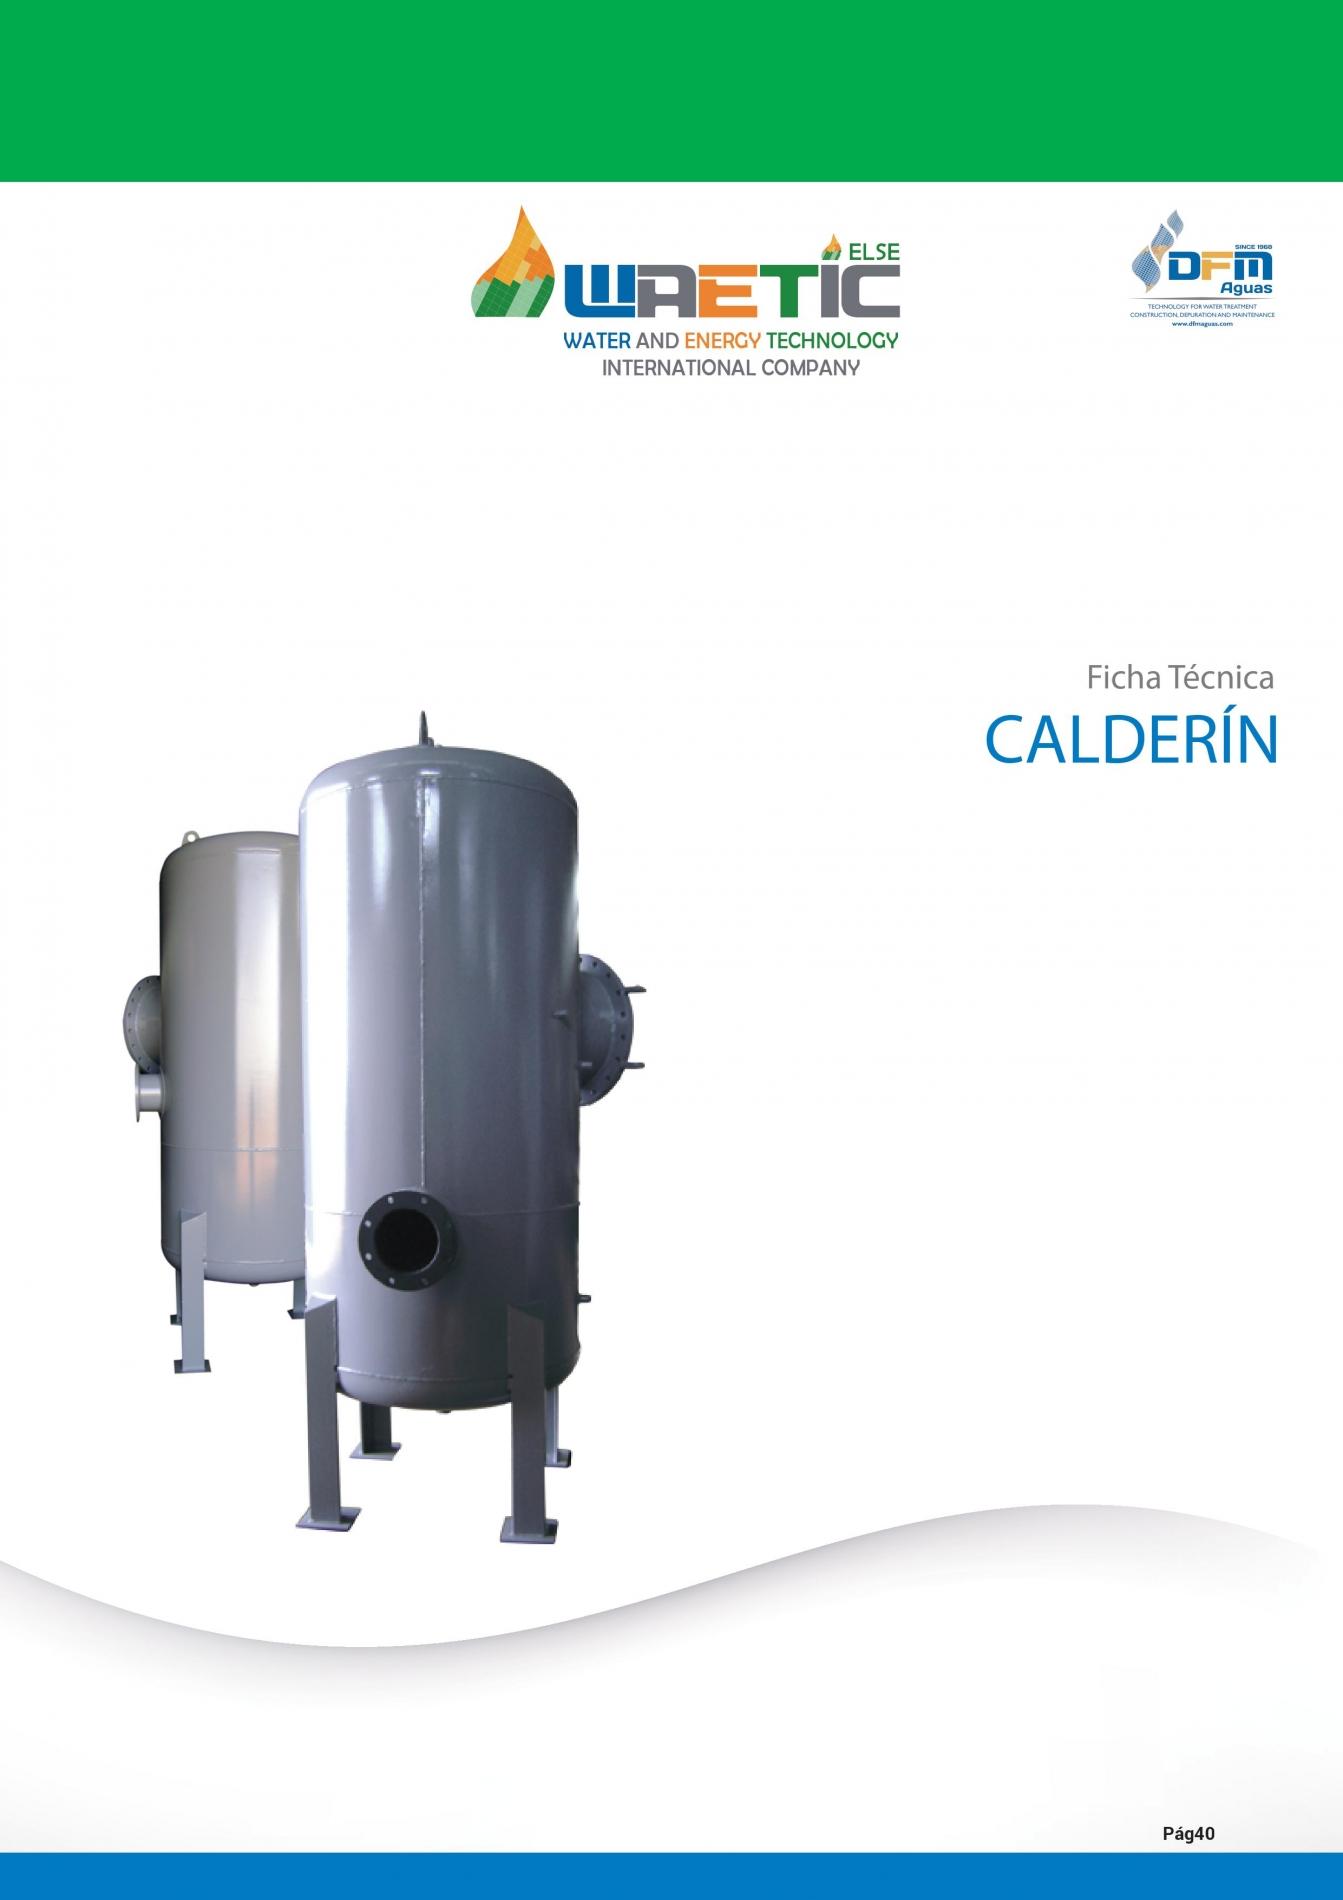 Calderin Presurizacion